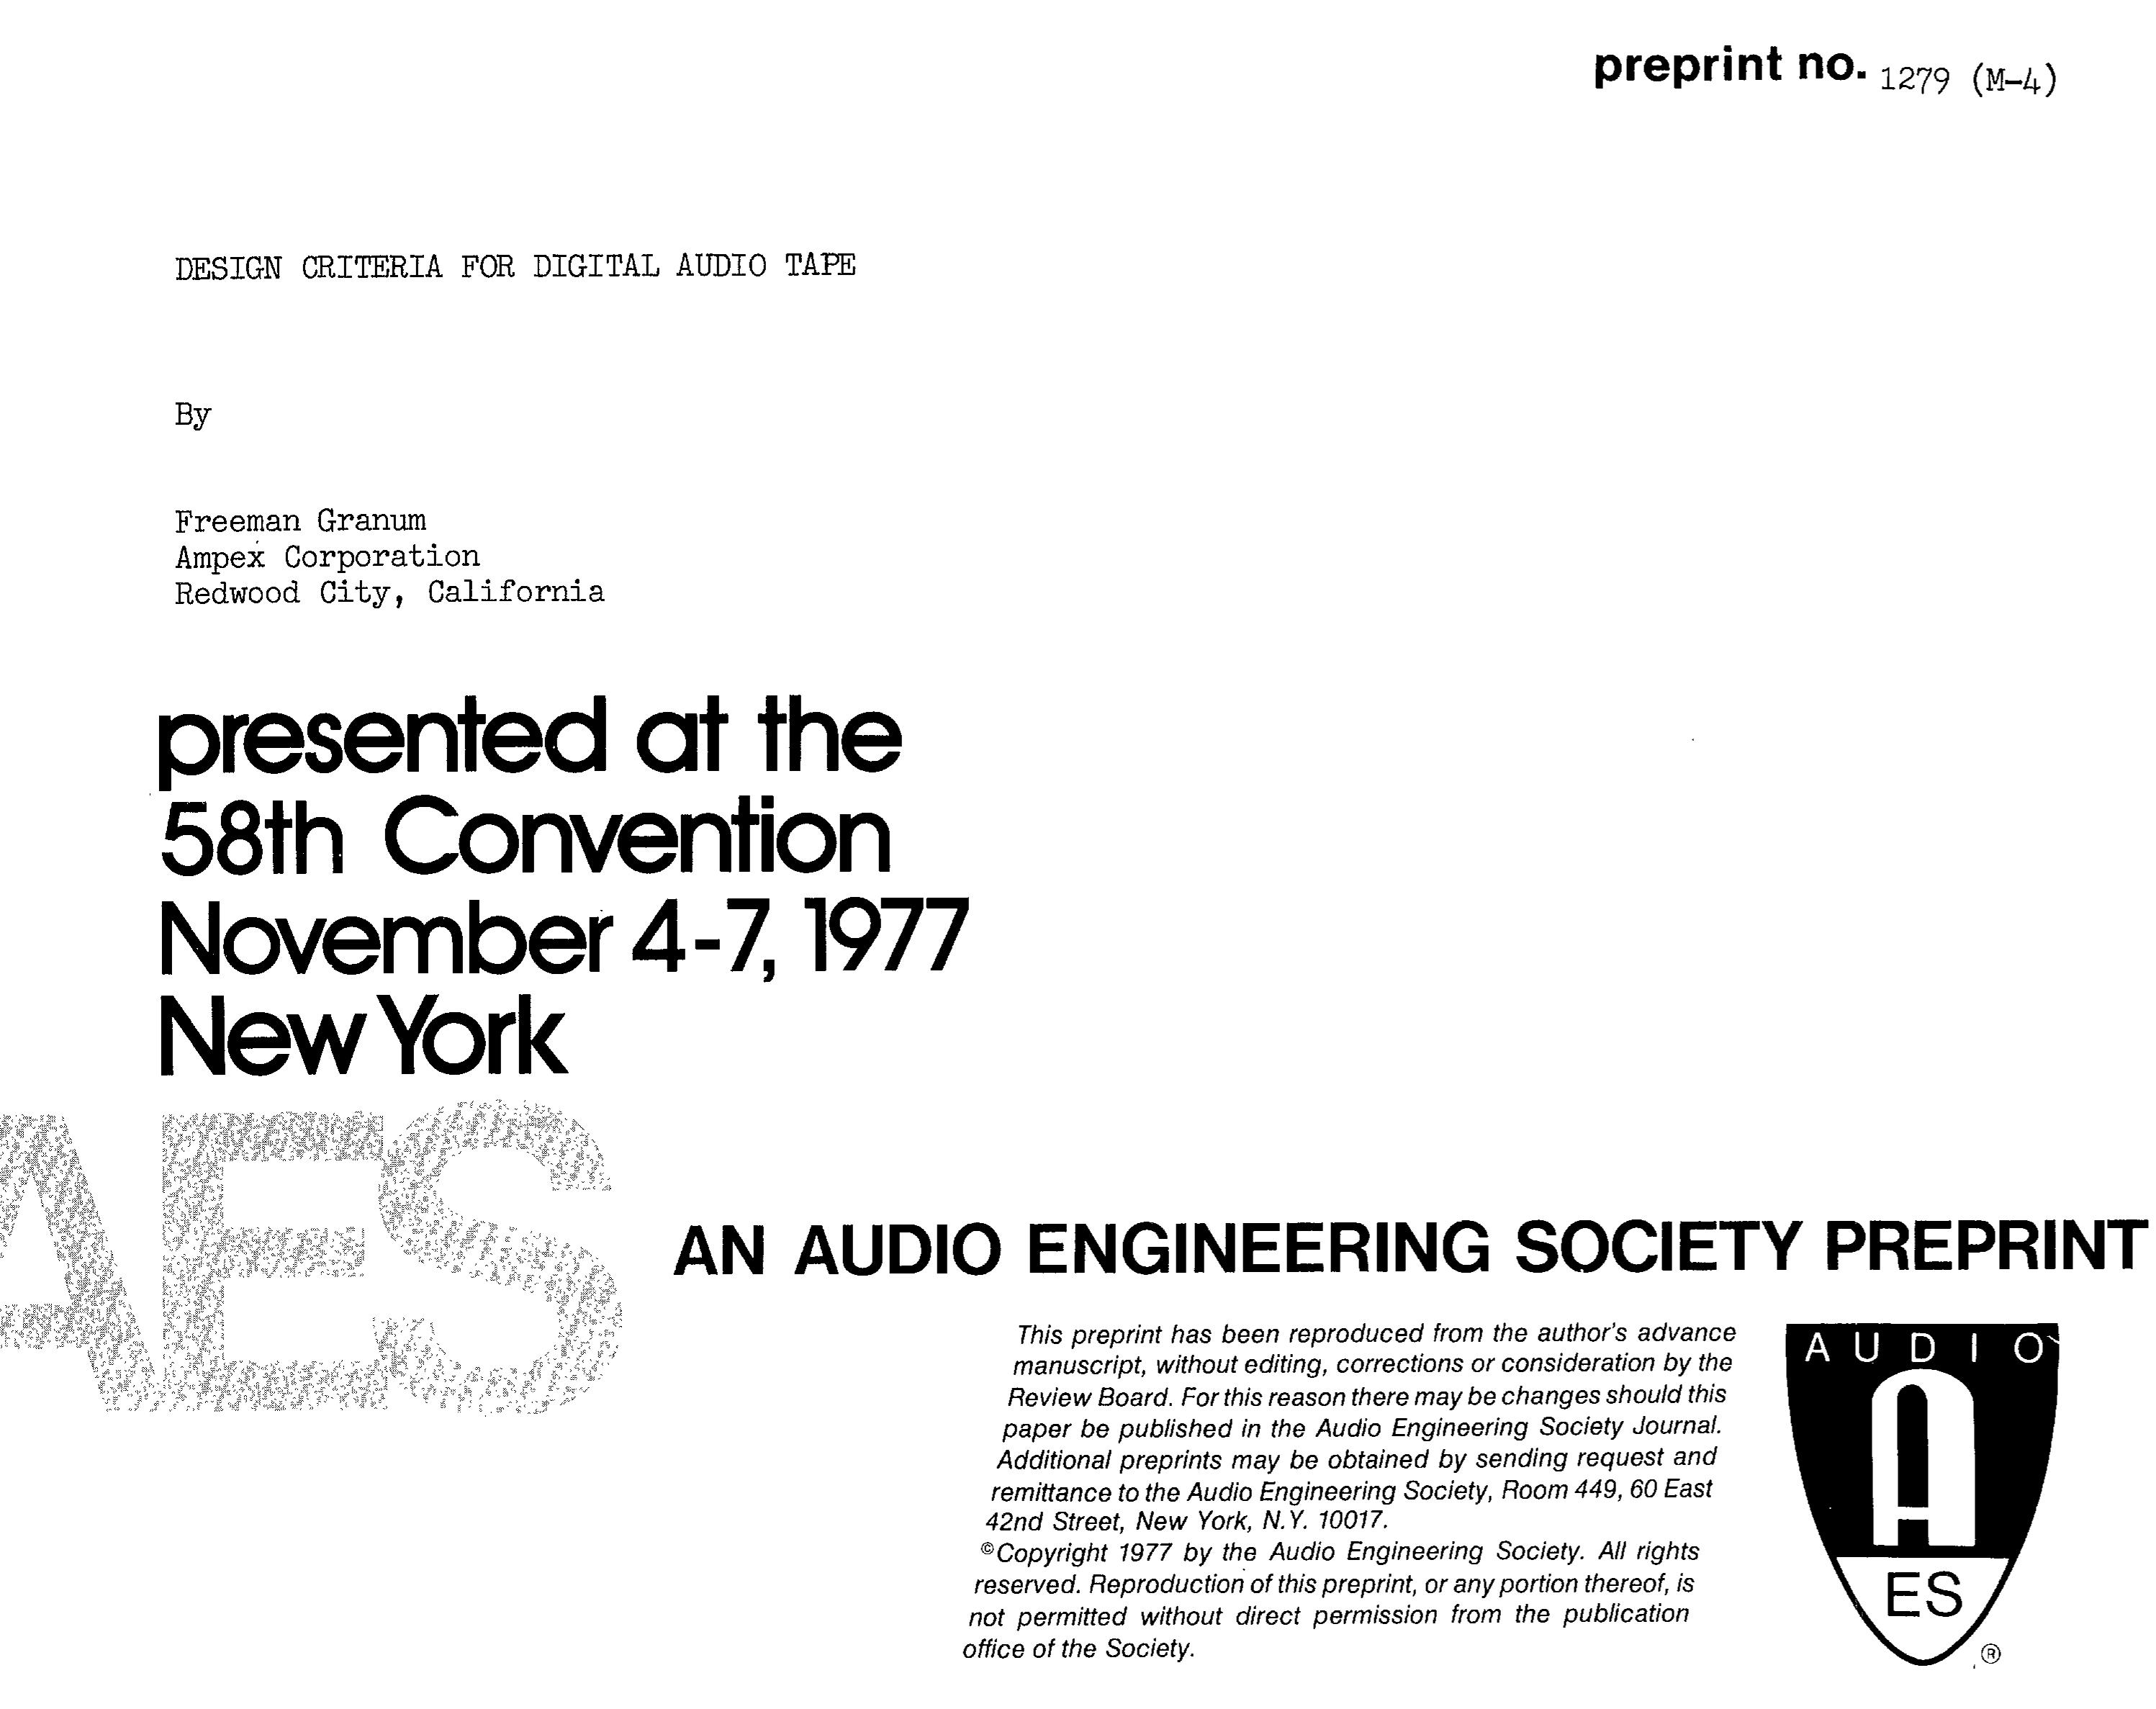 AES E-Library » Design Criteria for Digital Audio Tape